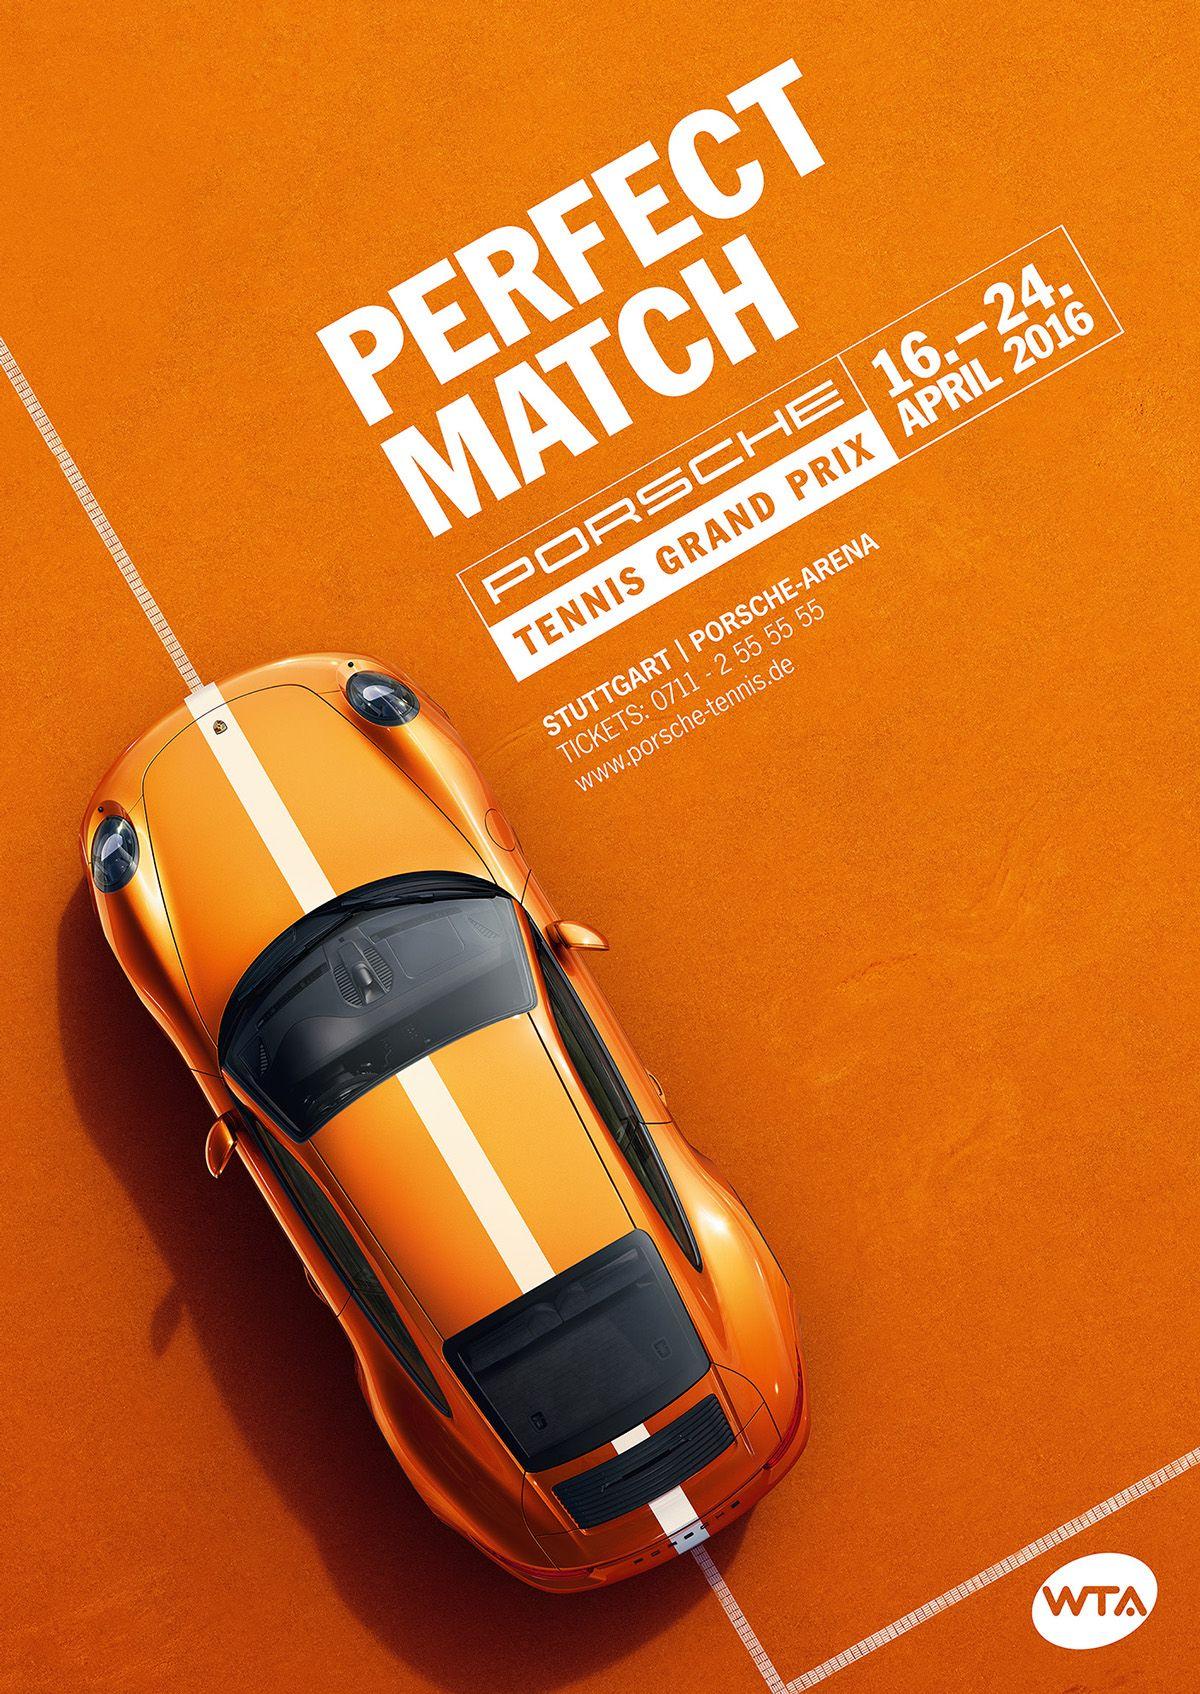 Porsche Tennis Grand Prix 2016 by Nicholas Schurr. poster